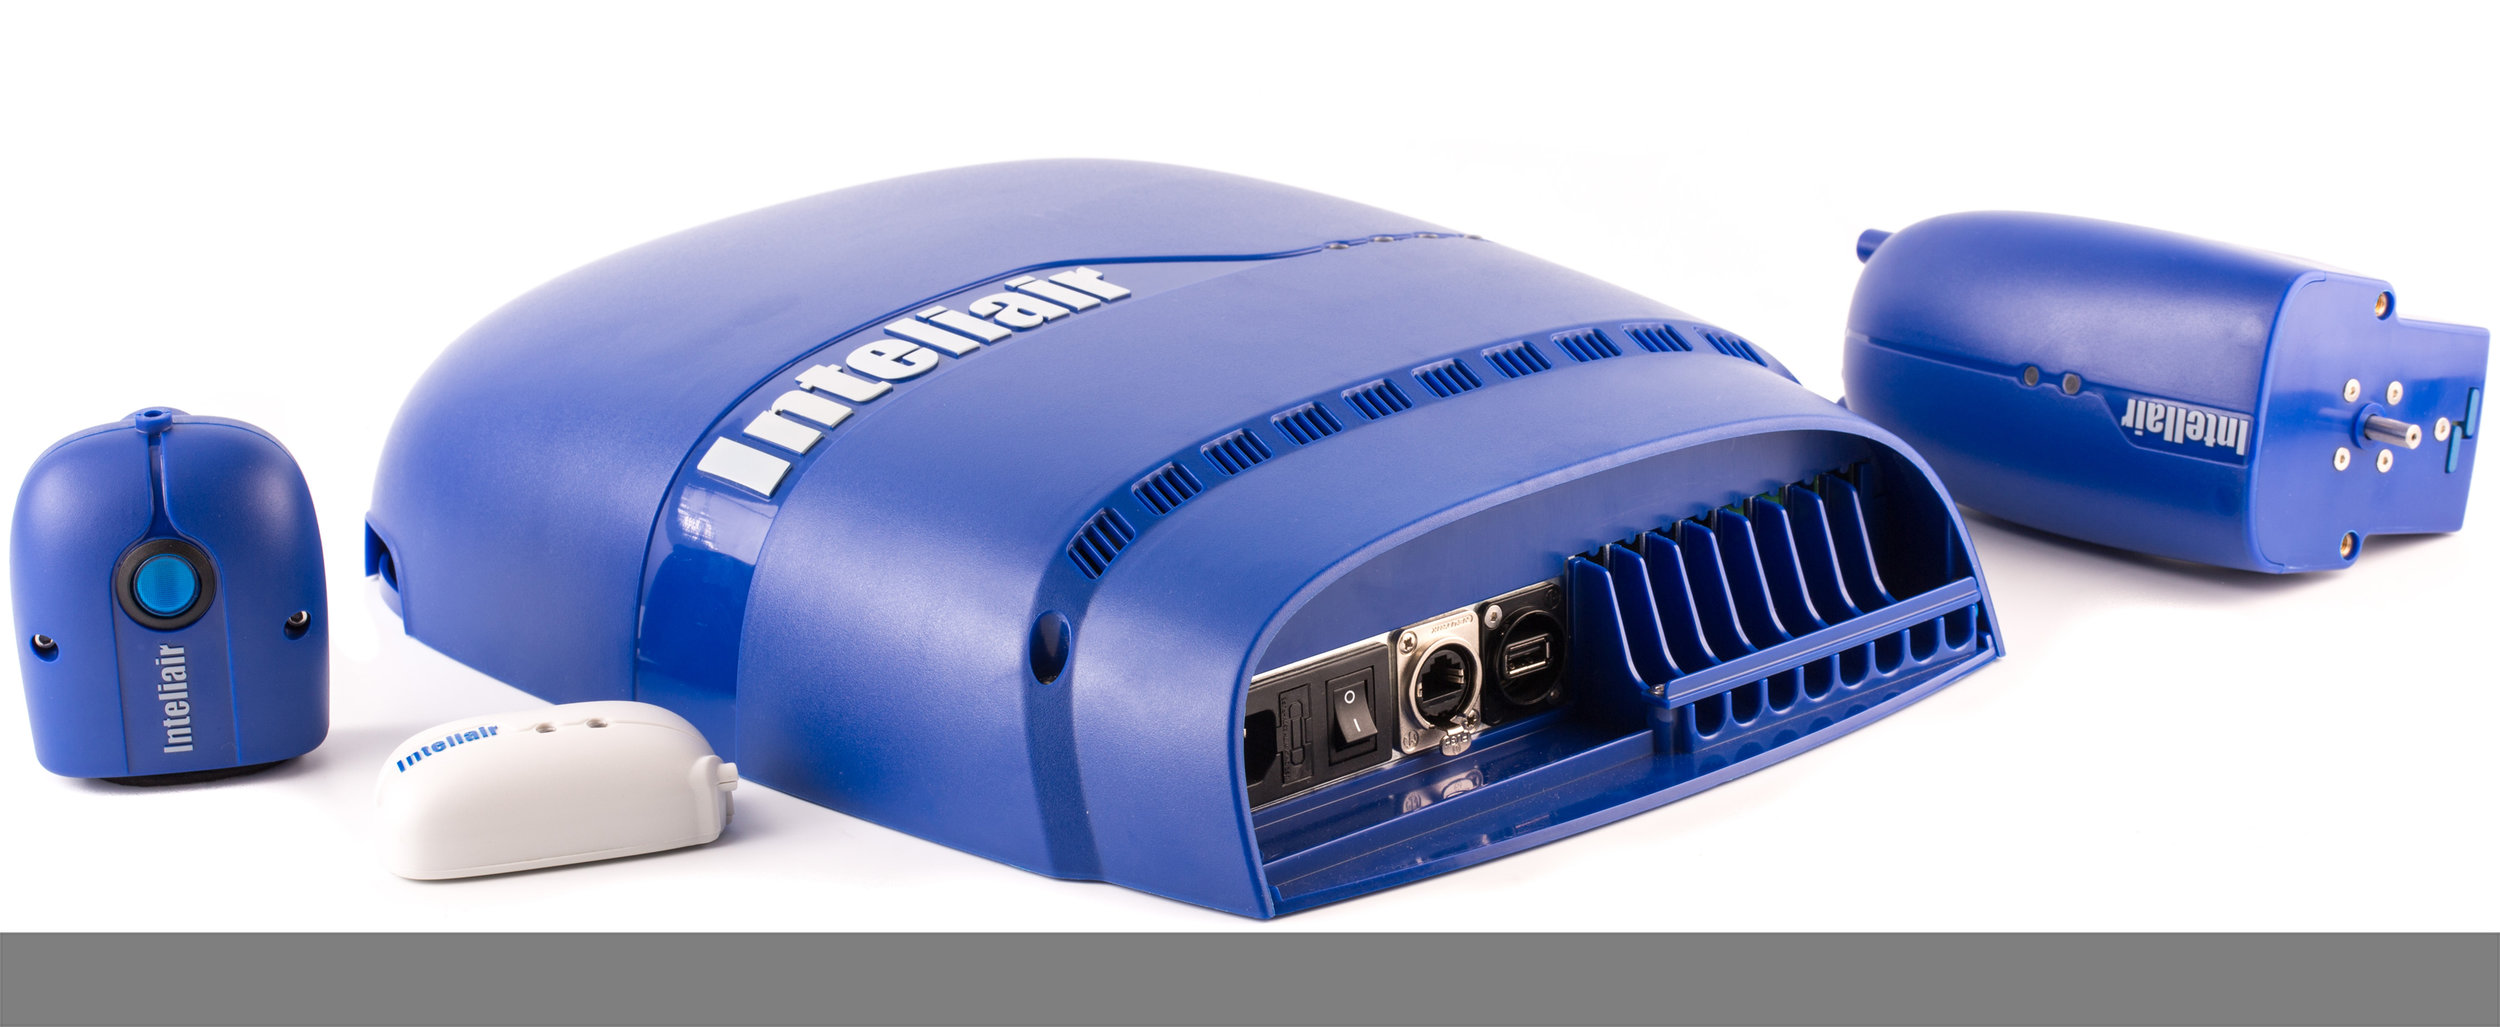 INTELIAIR: intelligent air management, image credit Inteliair